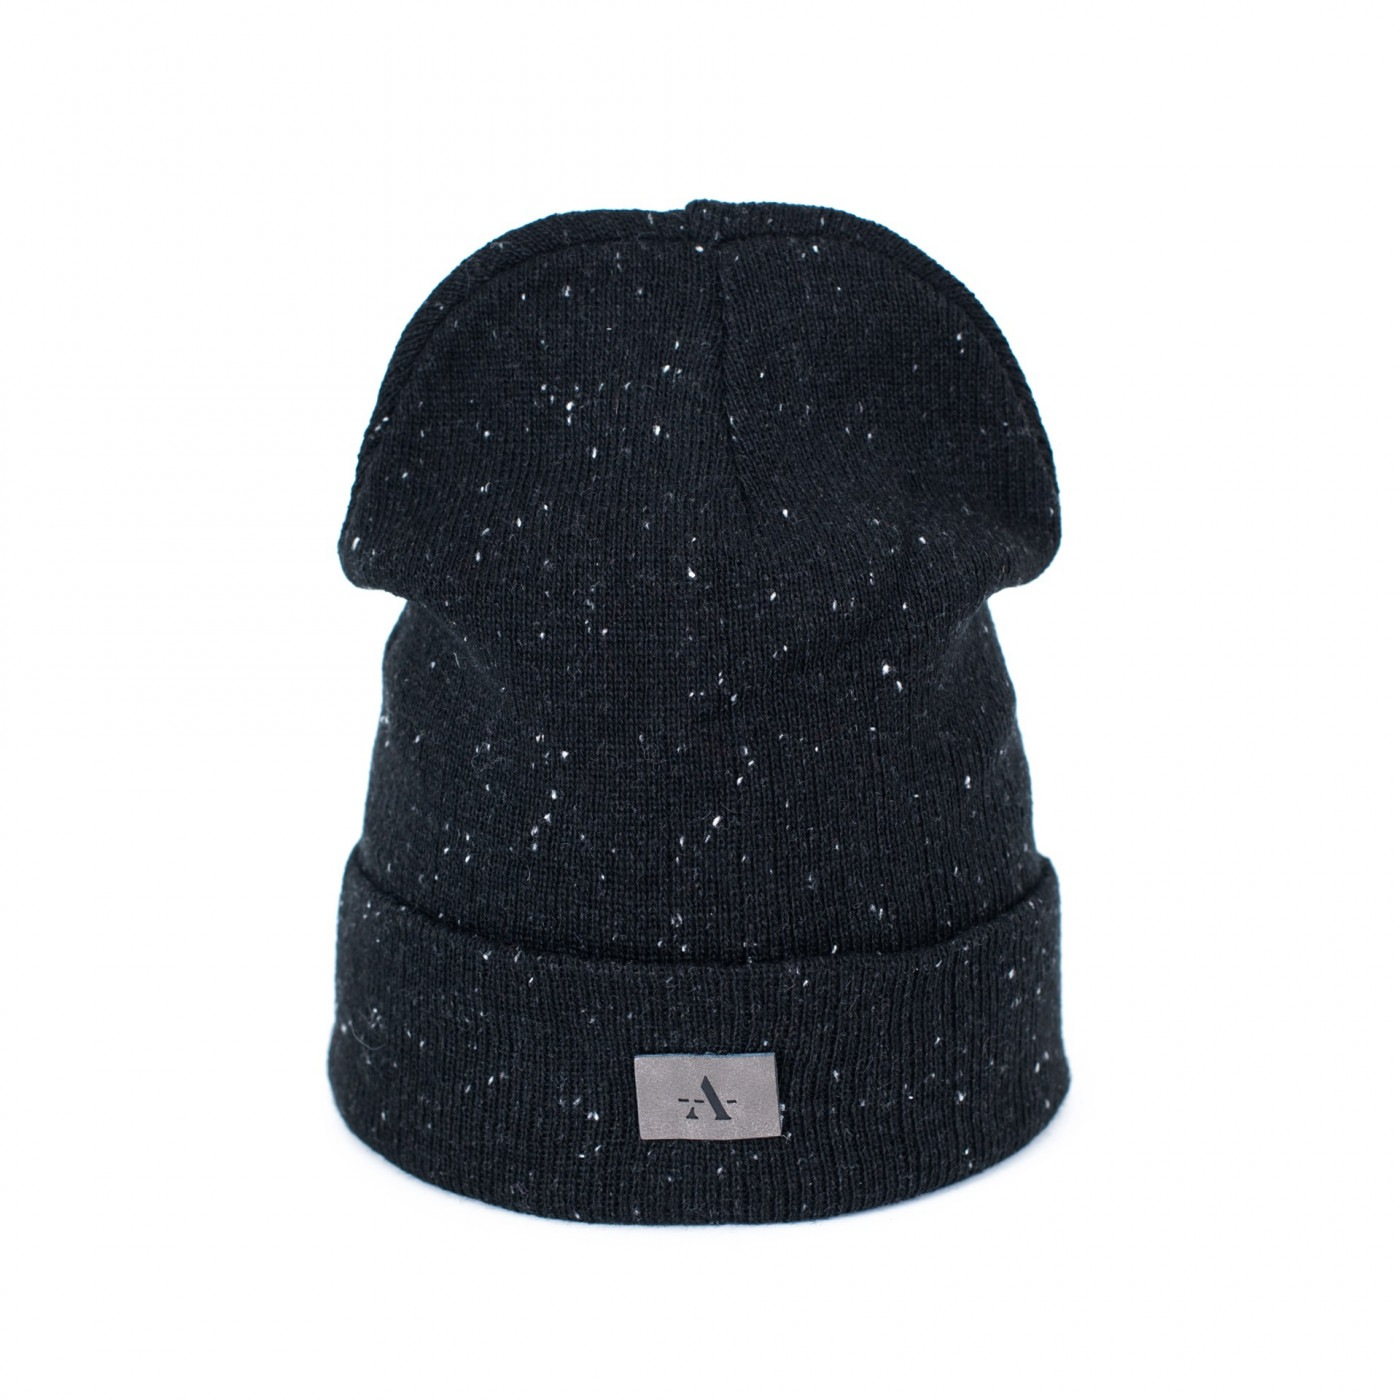 Art Of Polo Unisex's Hat cz18376